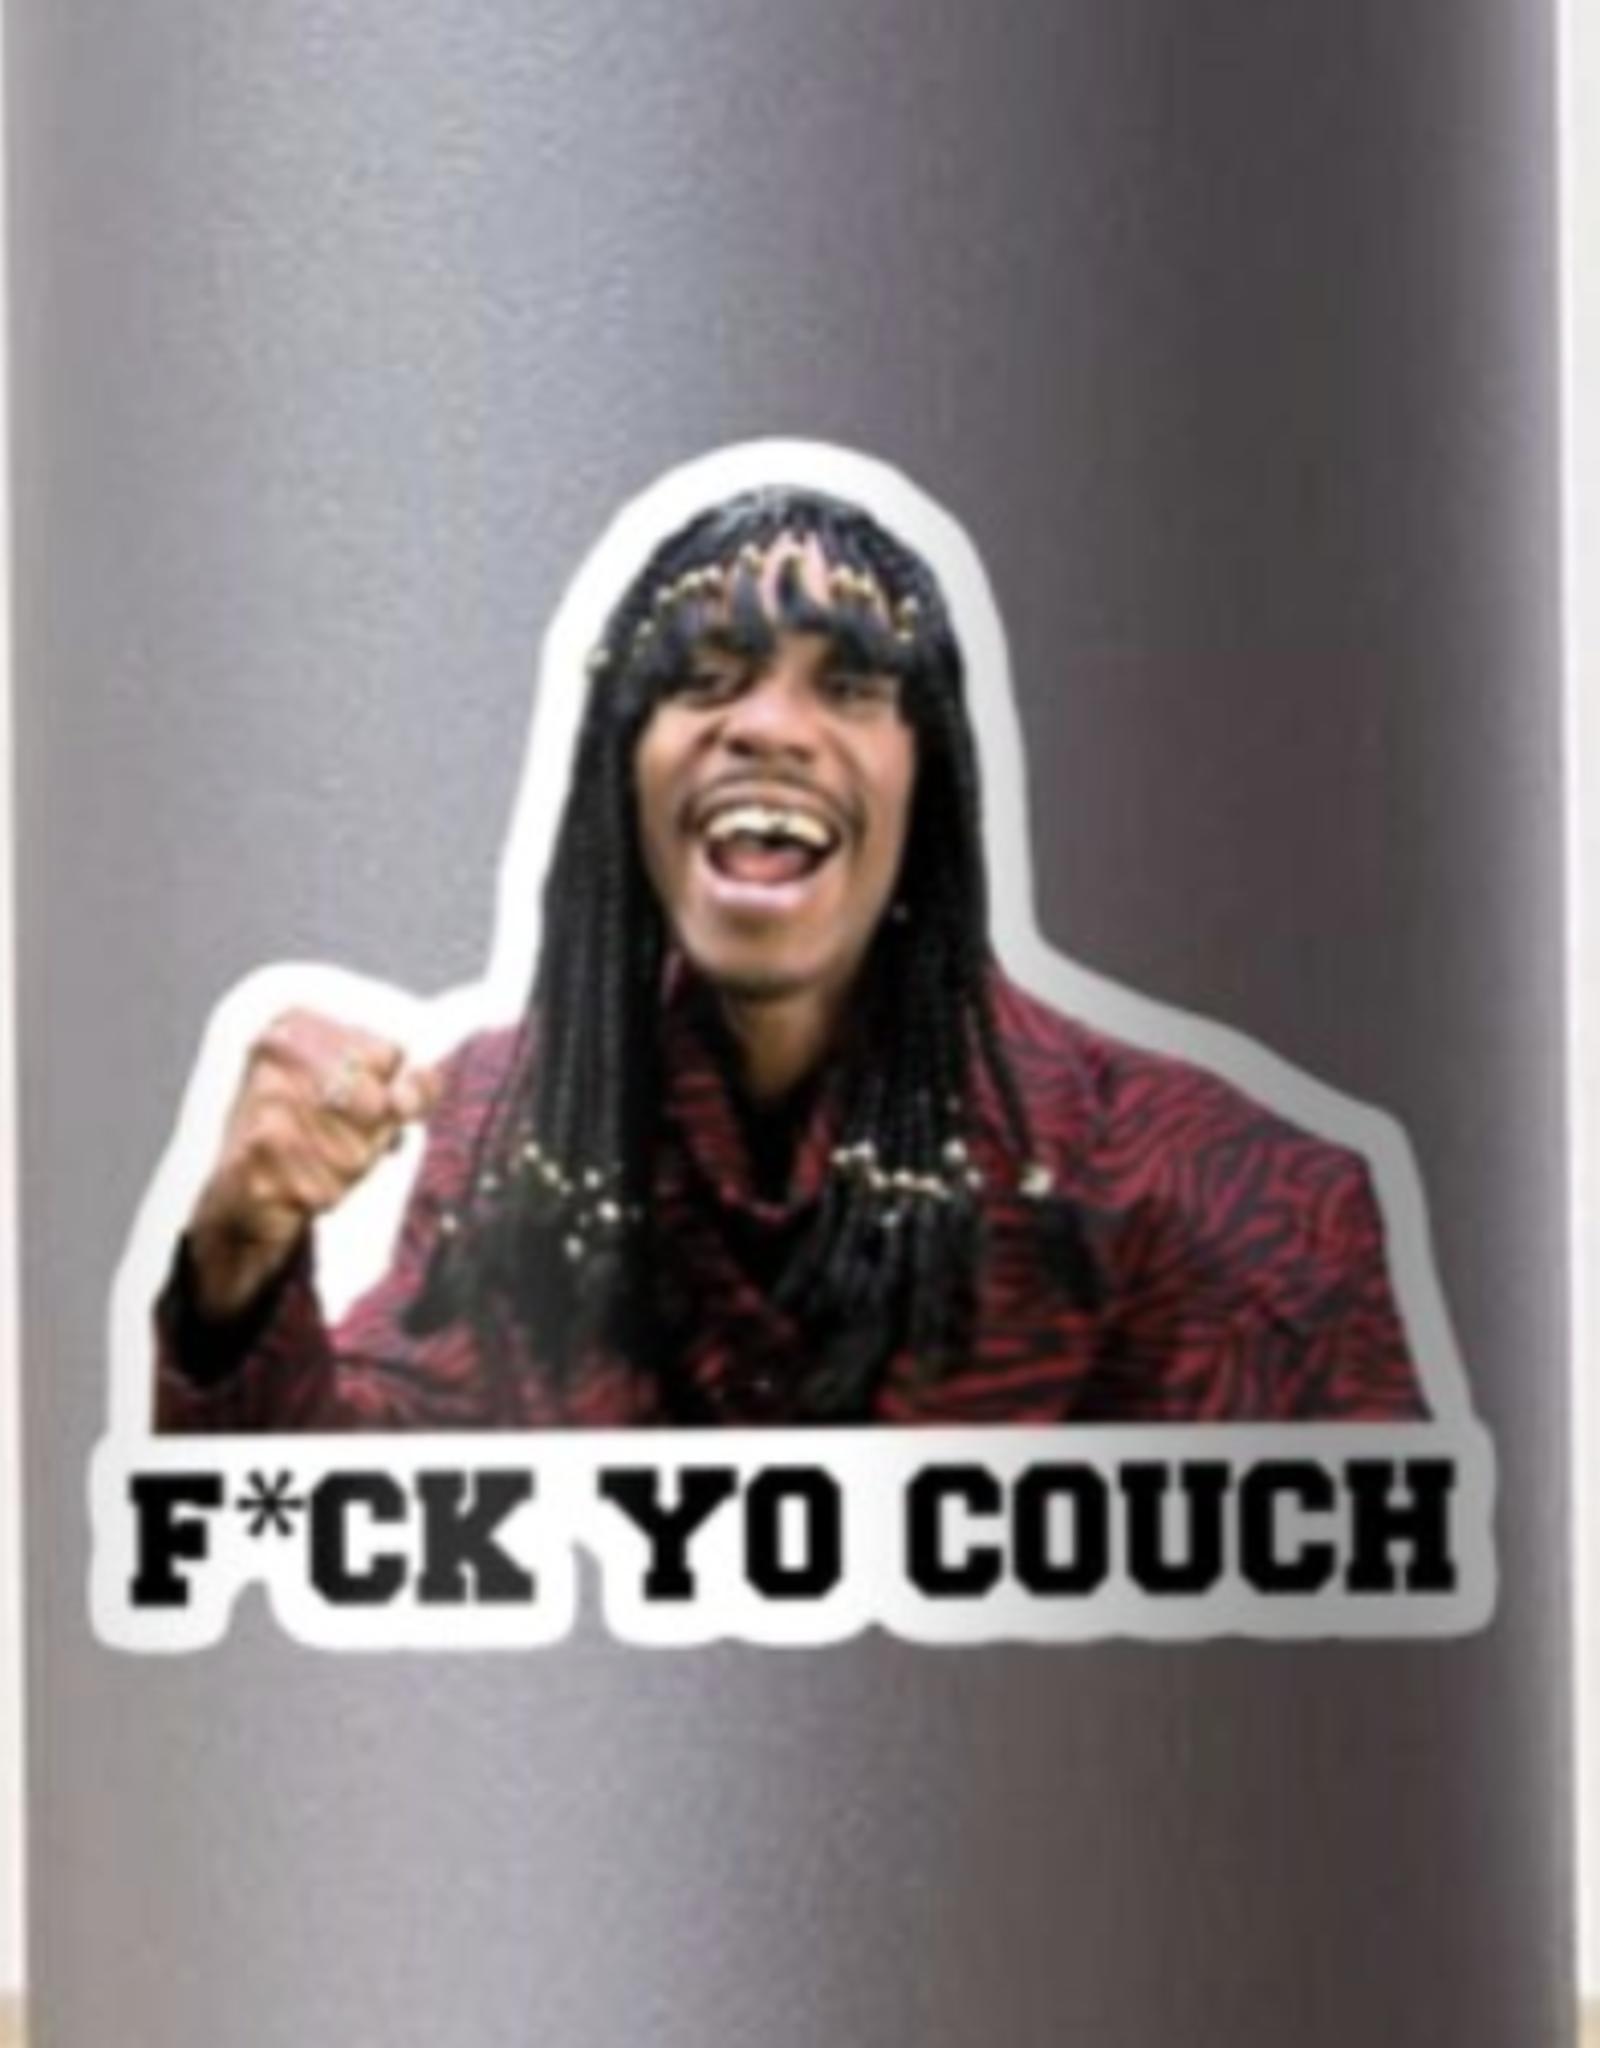 F*ck Yo Couch Sticker